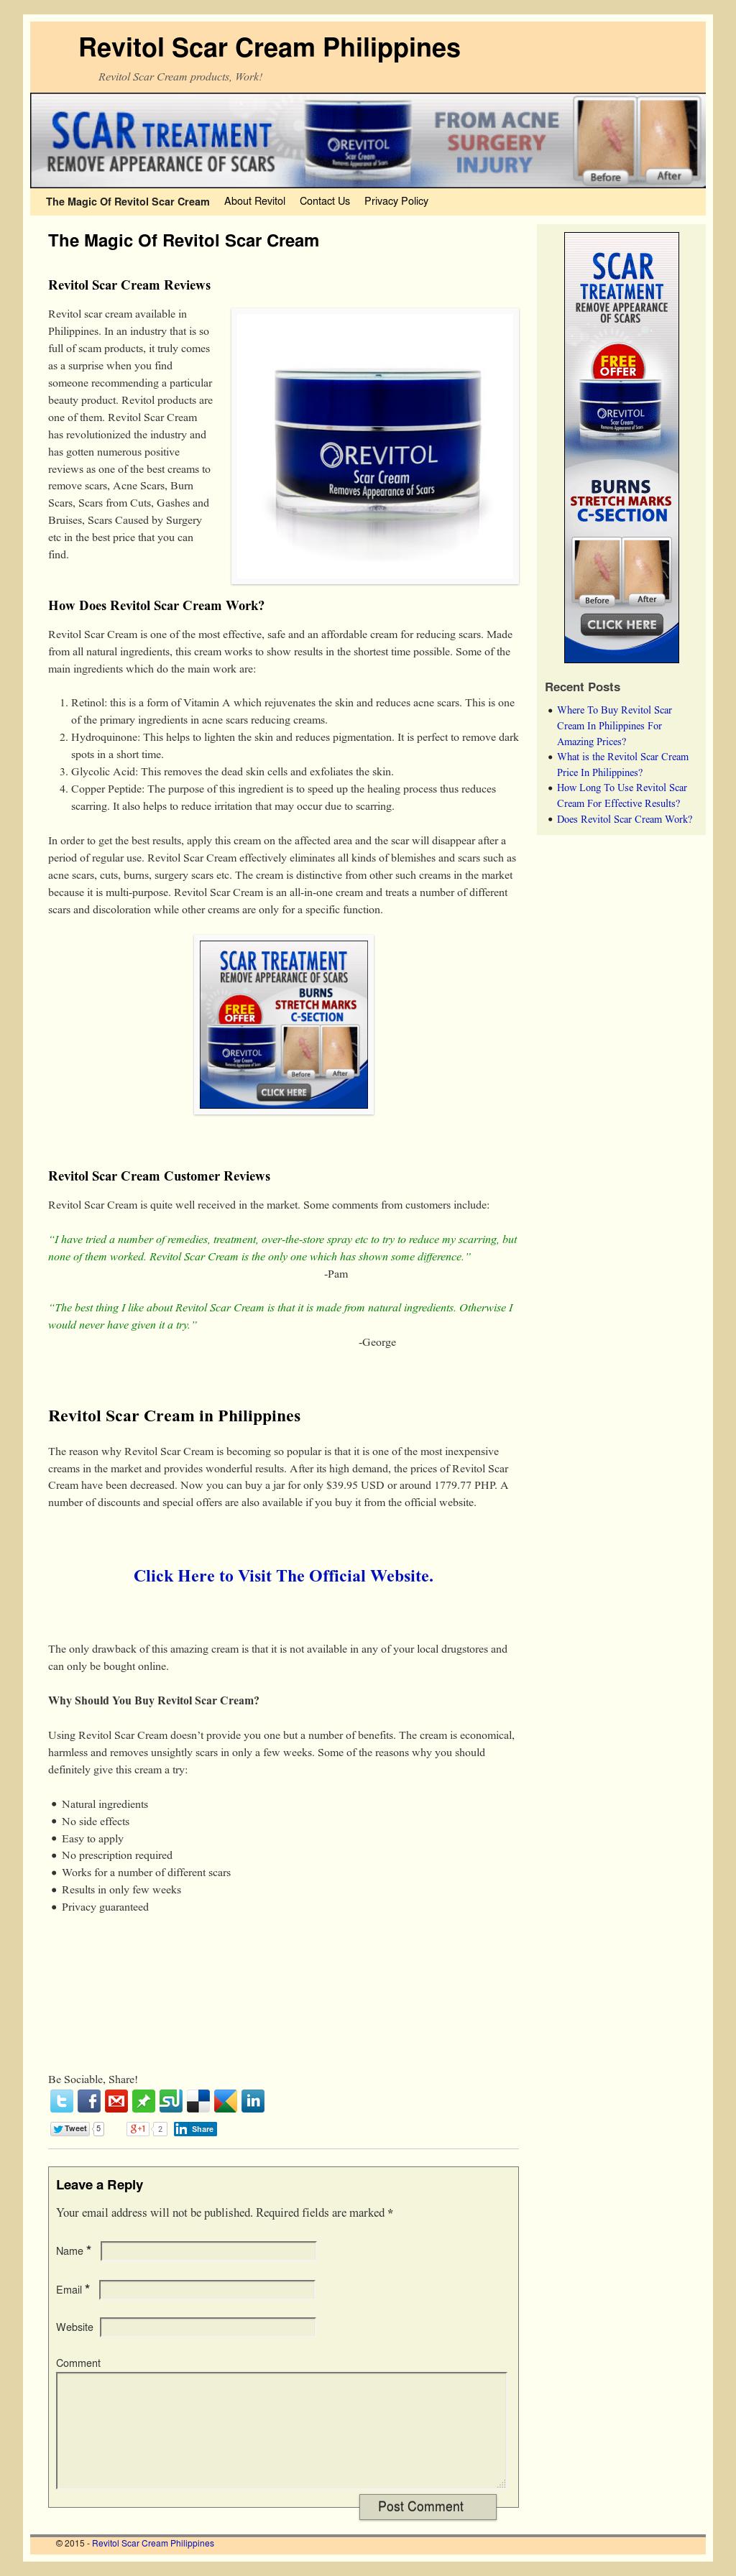 Revitol Scar Cream Philippines Competitors Revenue And Employees Owler Company Profile